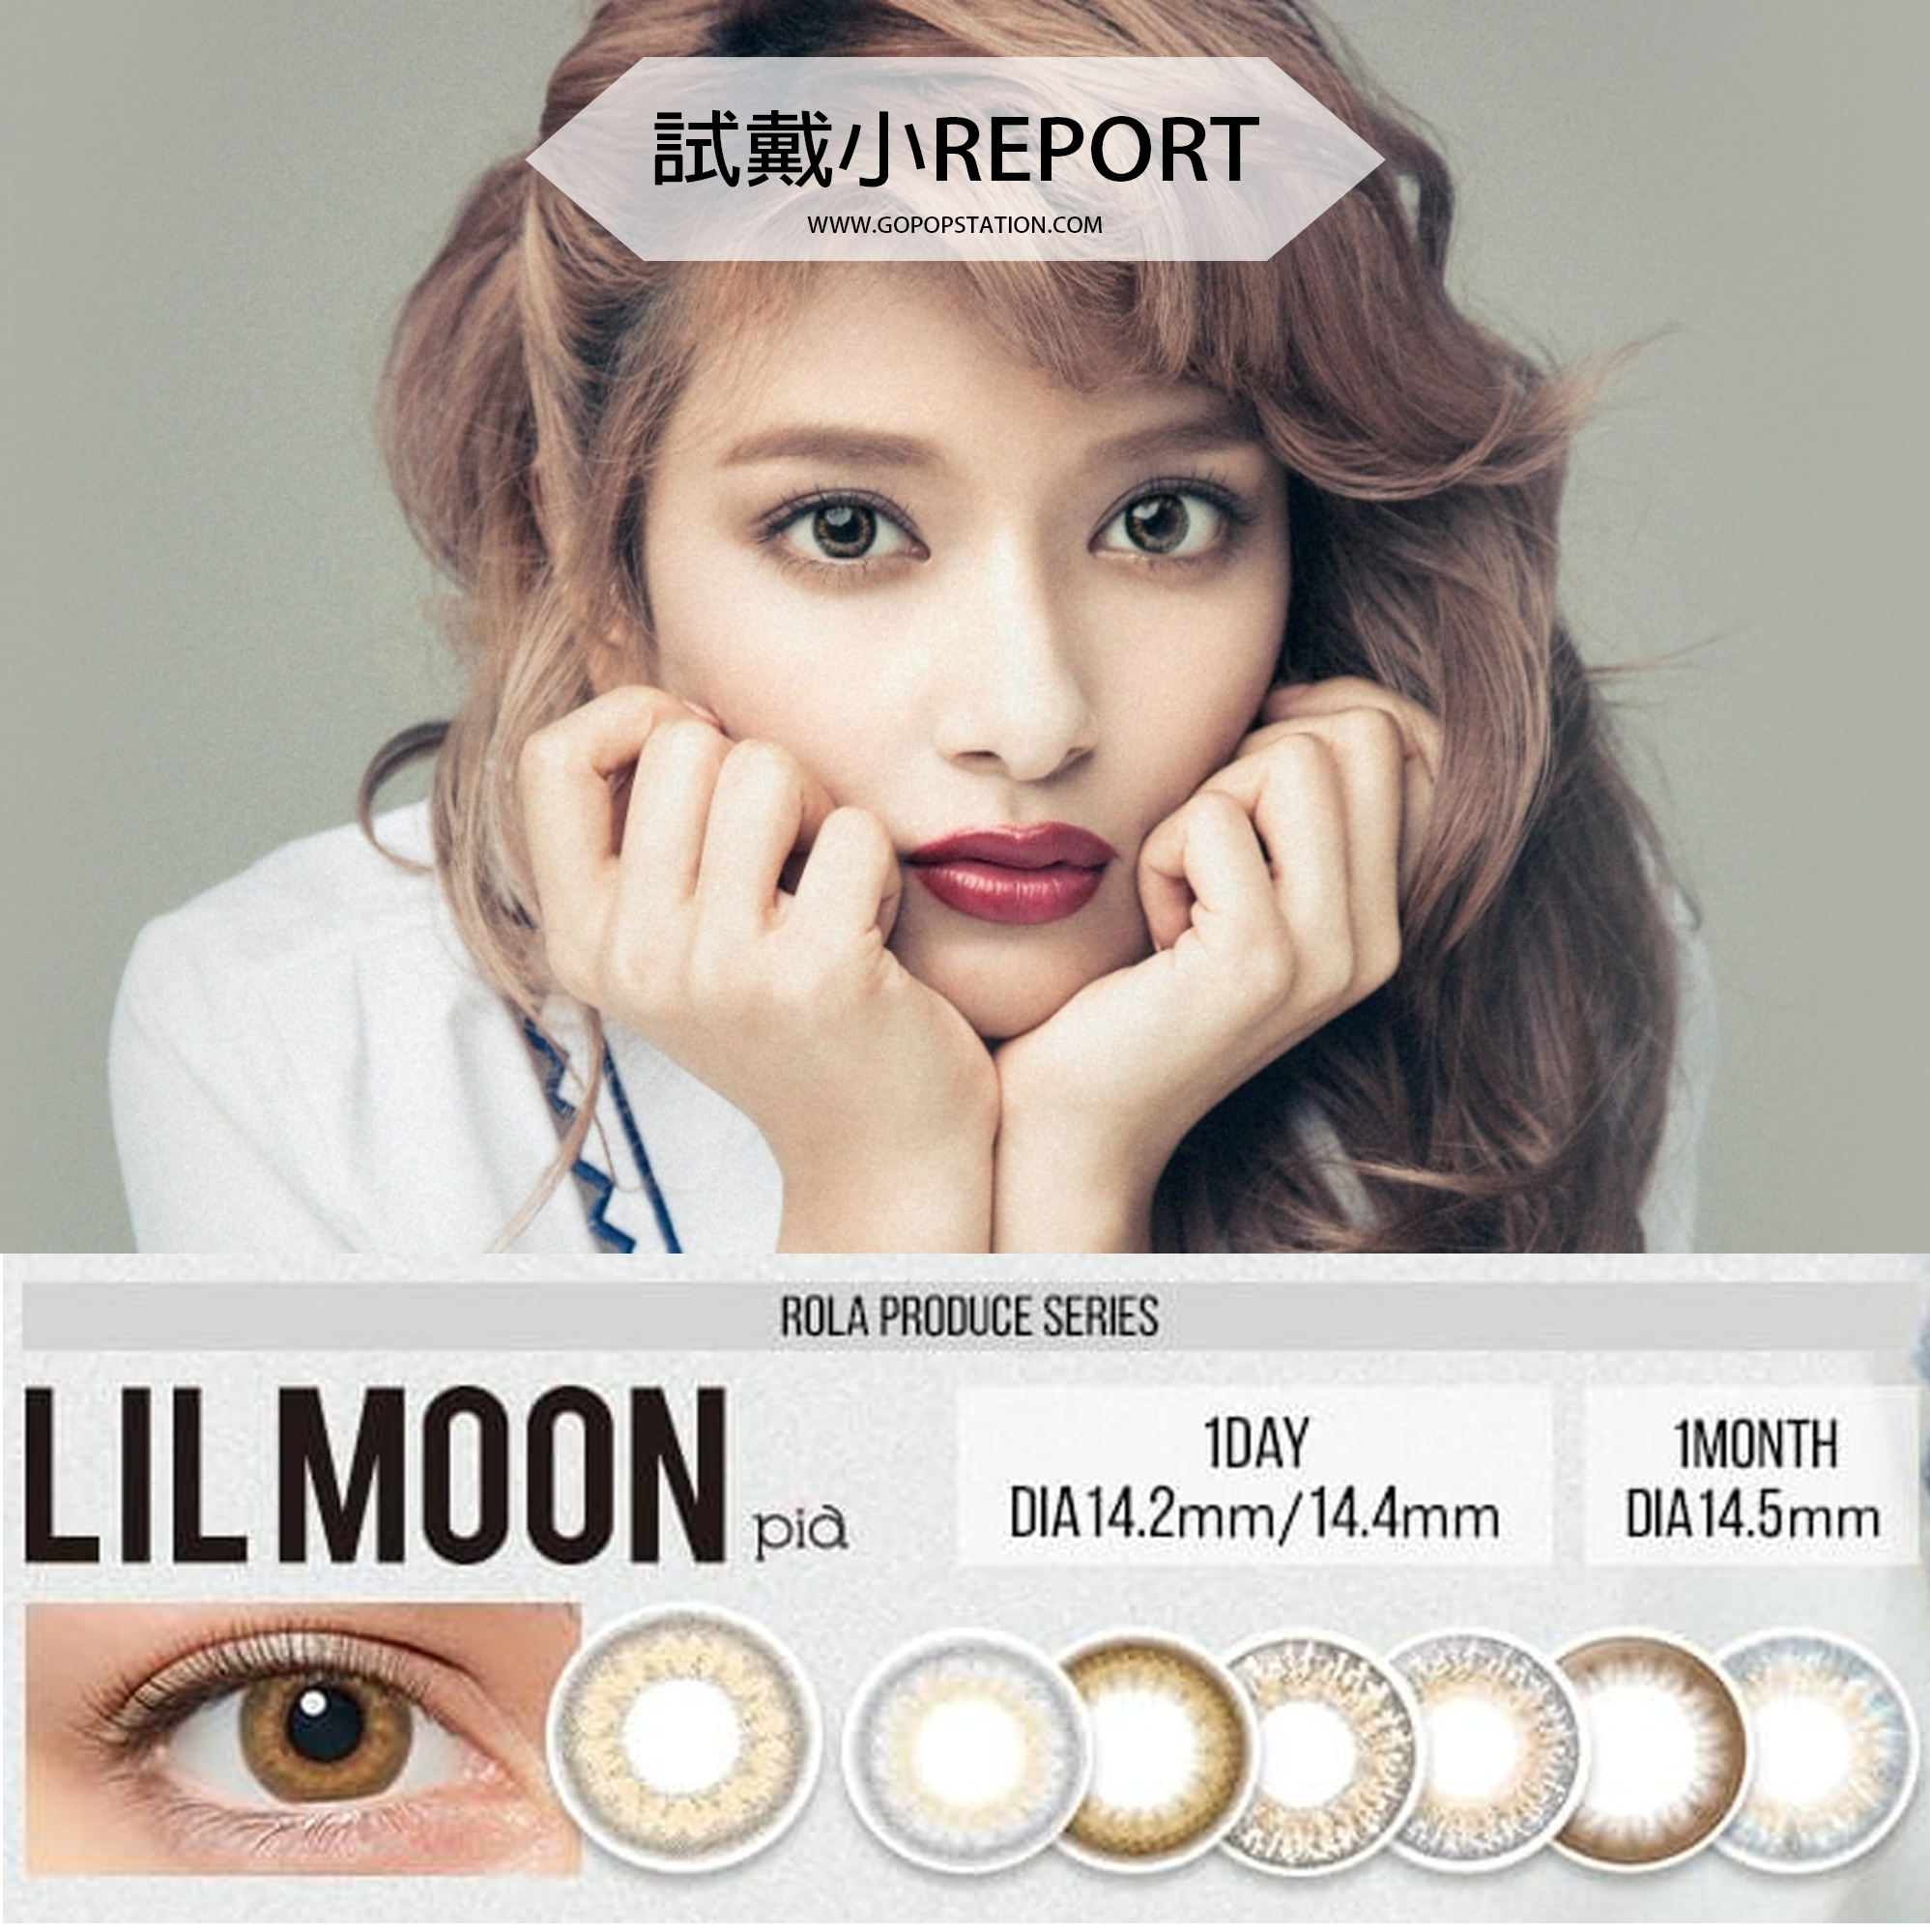 Lilmoon 隱形眼鏡介紹